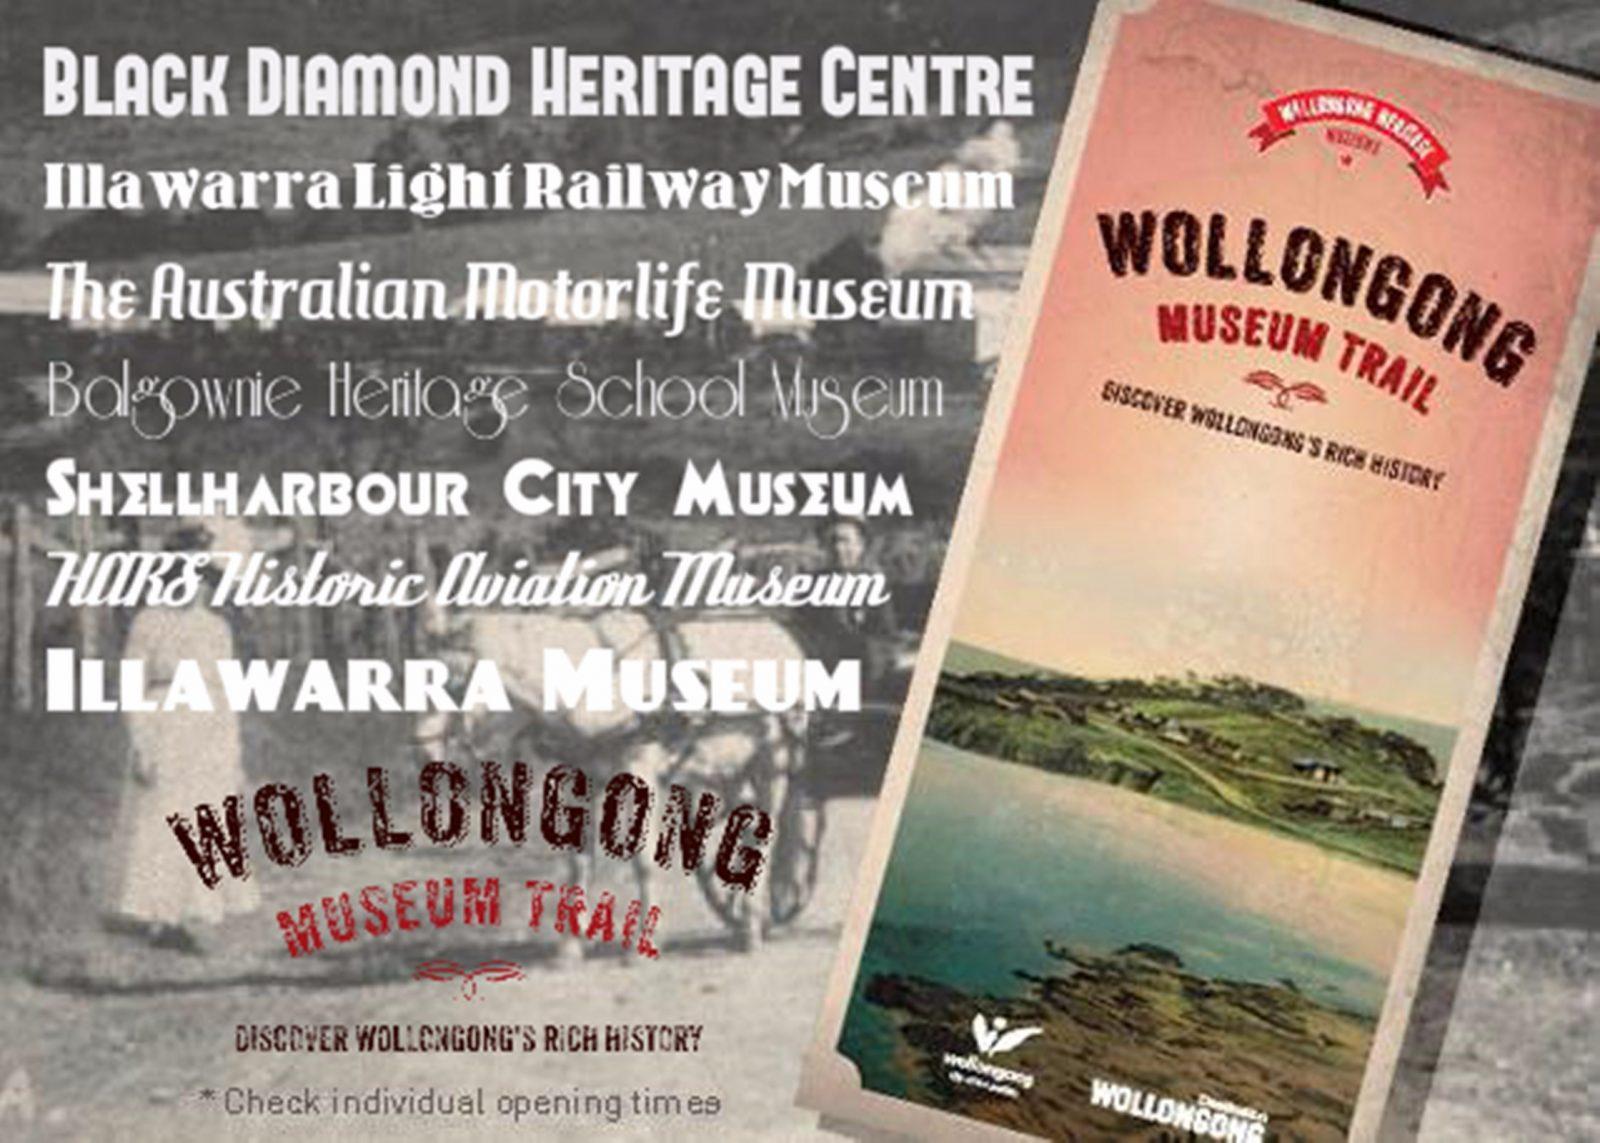 Wollongong Museum Trail